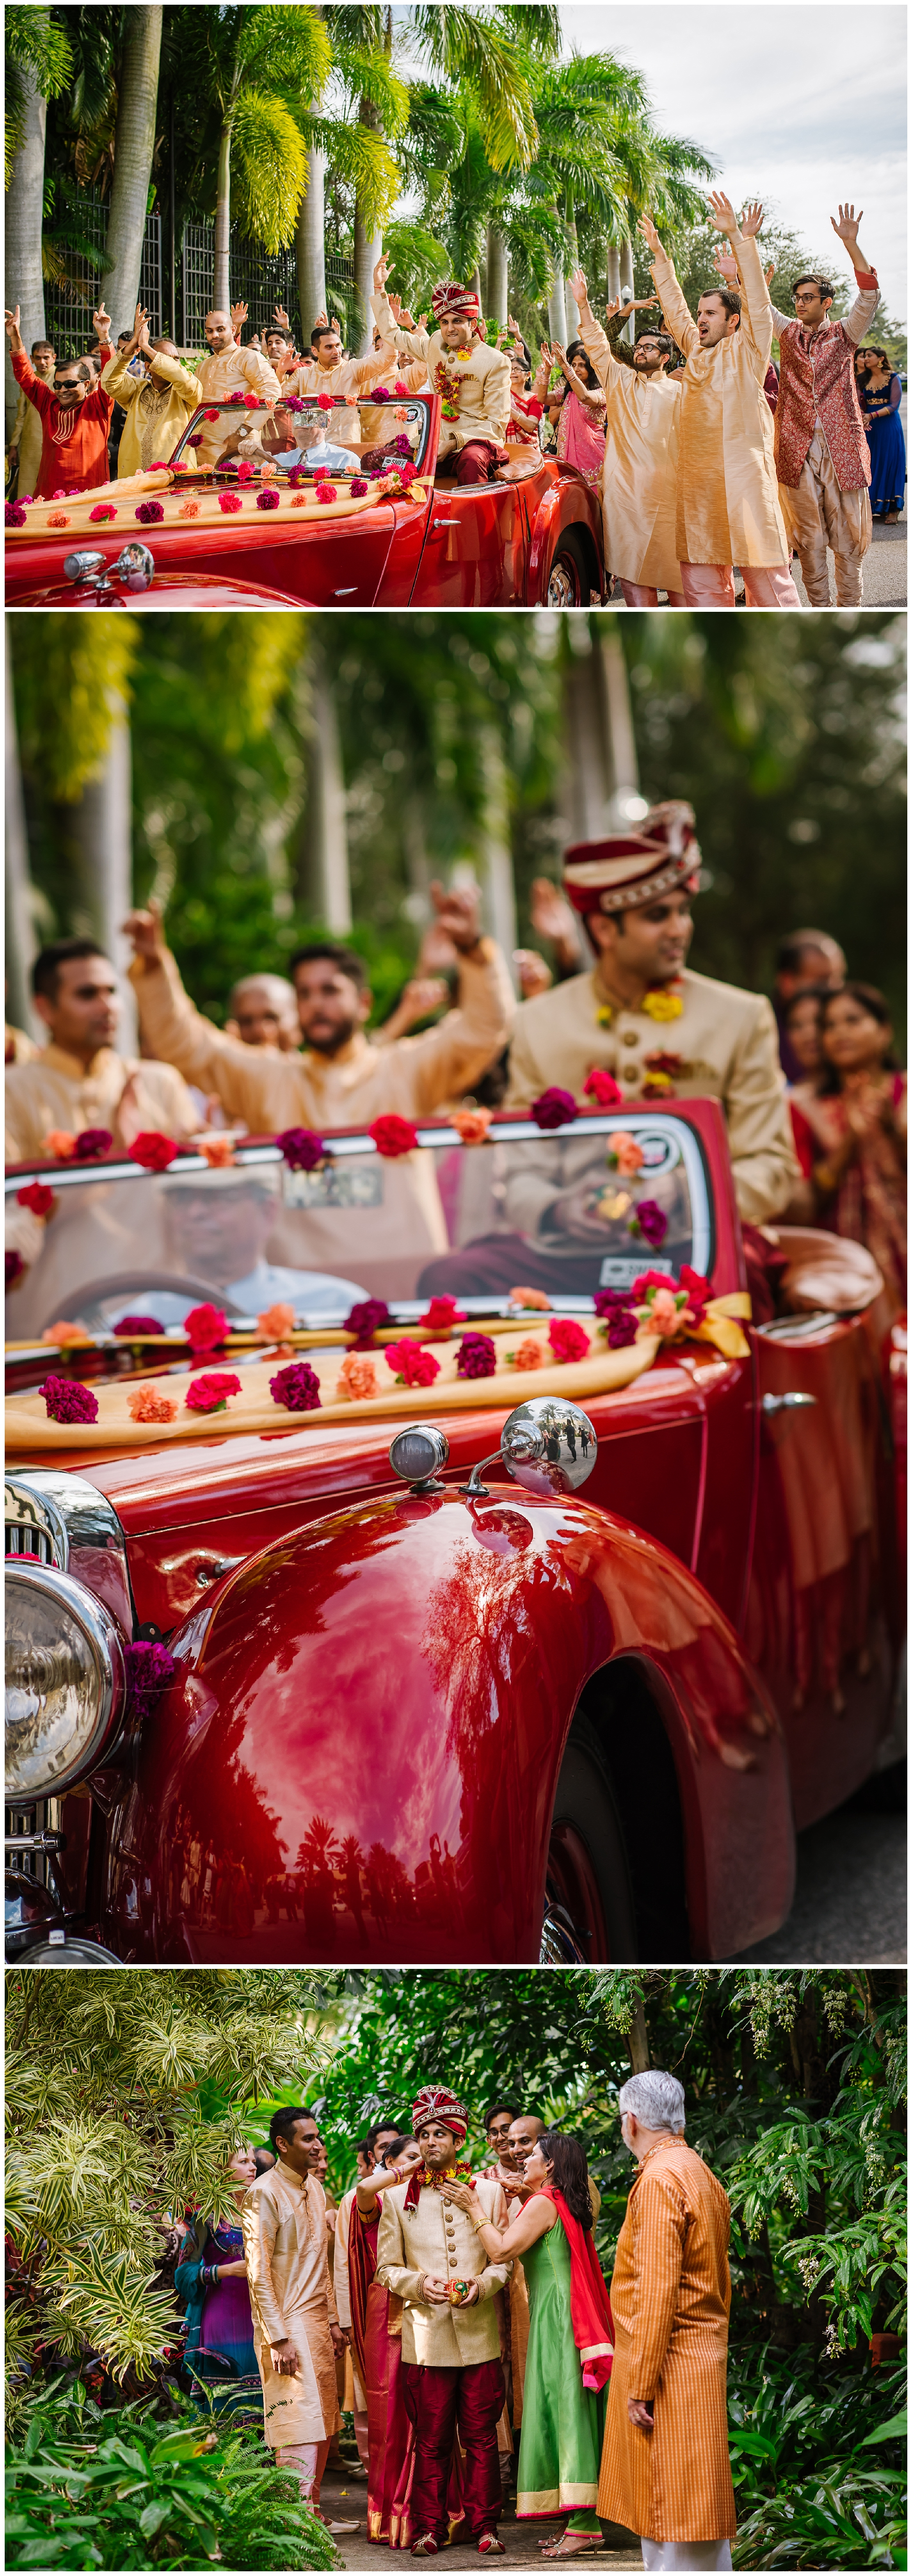 Ashlee-hamon-photography-year-in-review-2016-travel-wanderlust-vsco-adventure-wedding_0027.jpg